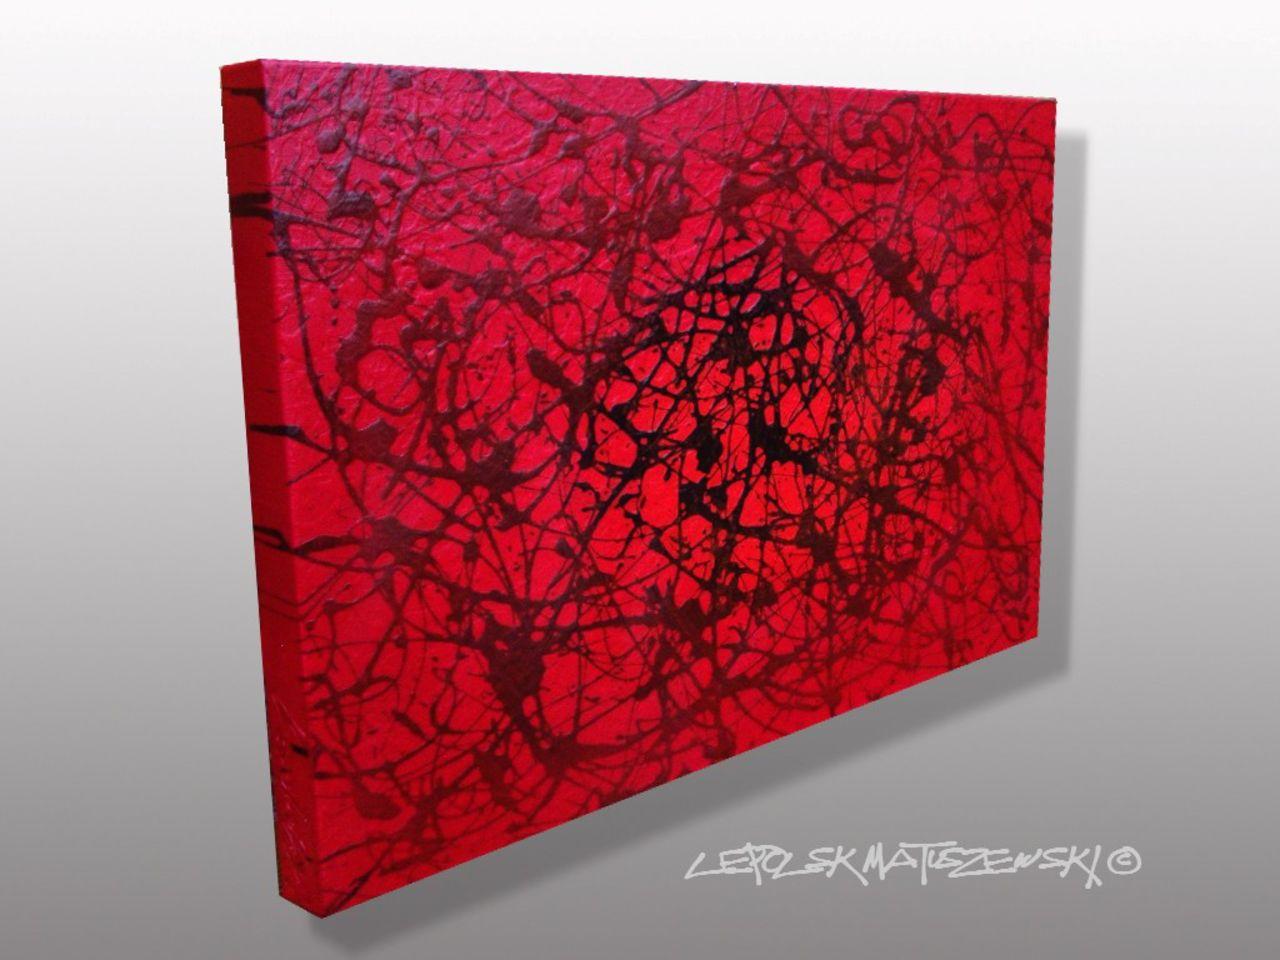 MISTER K  (Lepolsk Matuszewski) FLOW  Expressionnisme abstrait contemporain